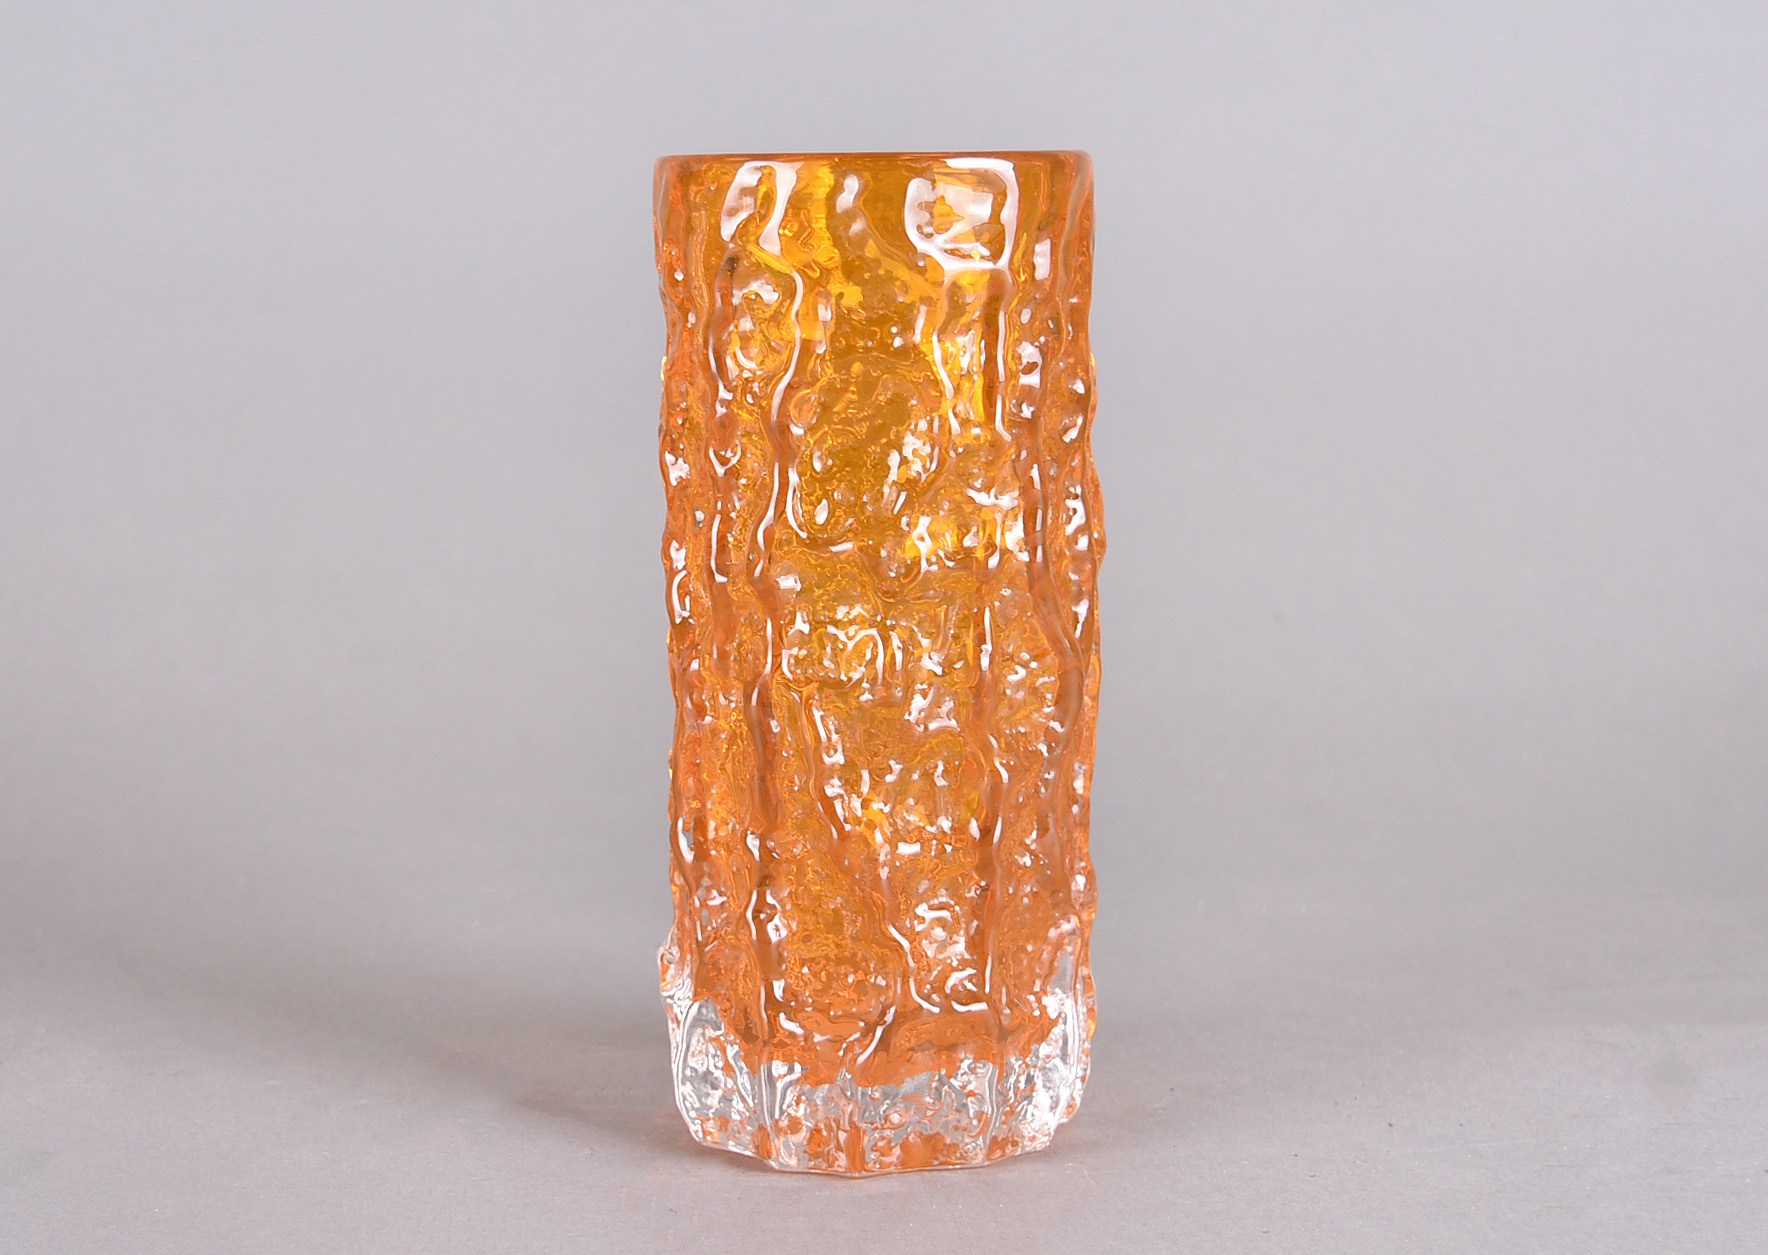 A Whitefriars tangerine glass 'Bark' vase by Geoffrey Baxter, from 'Textured' range, pattern